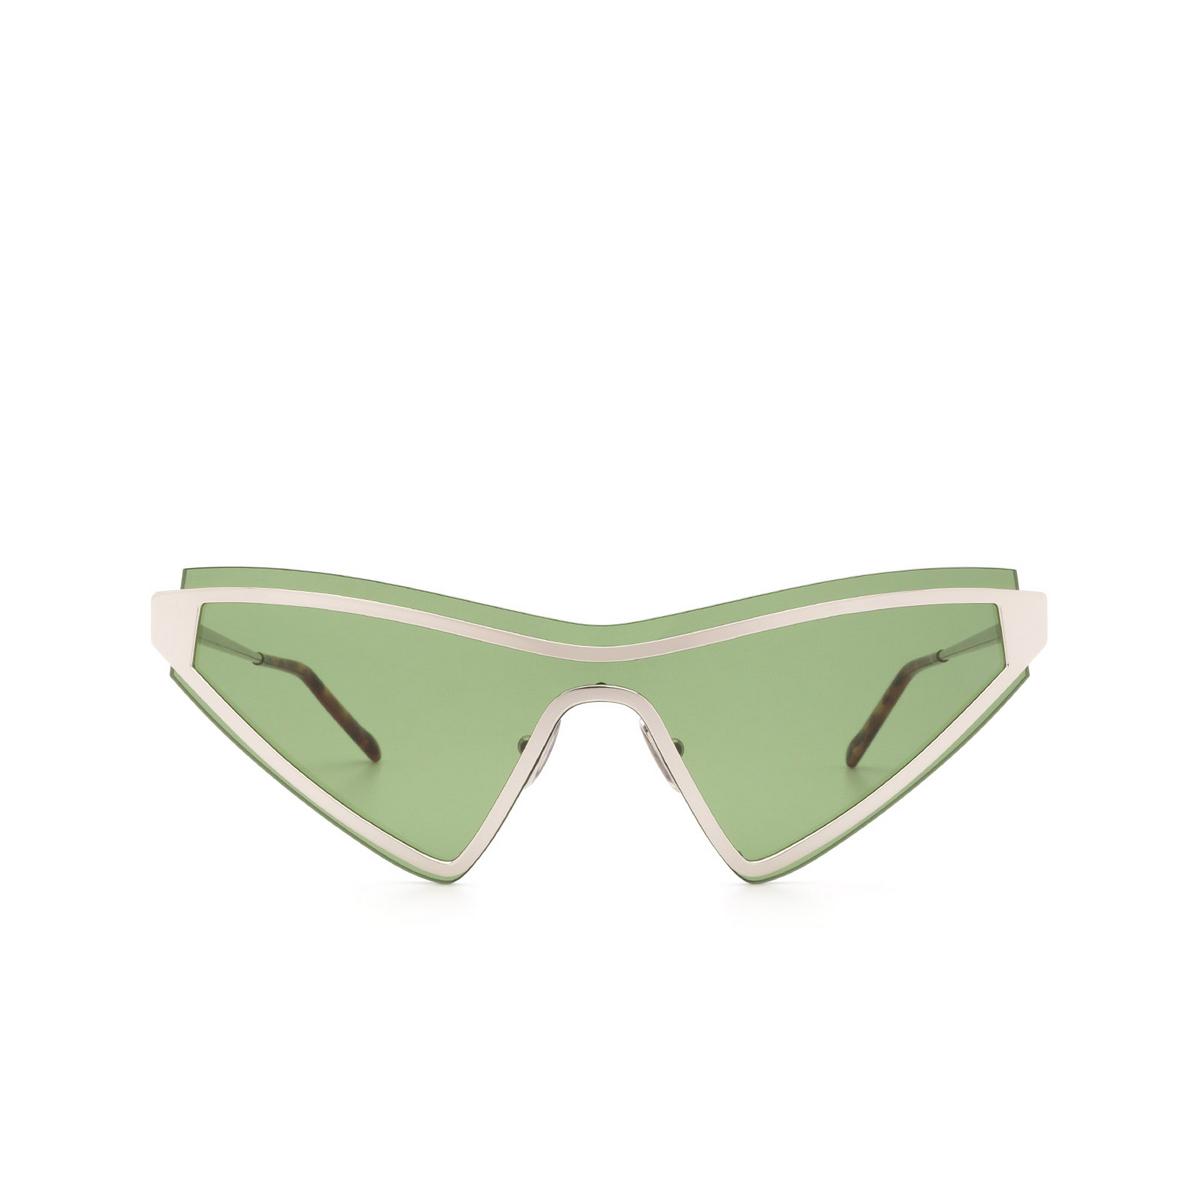 Sportmax® Cat-eye Sunglasses: SM0024 color Shiny Palladium 16N.